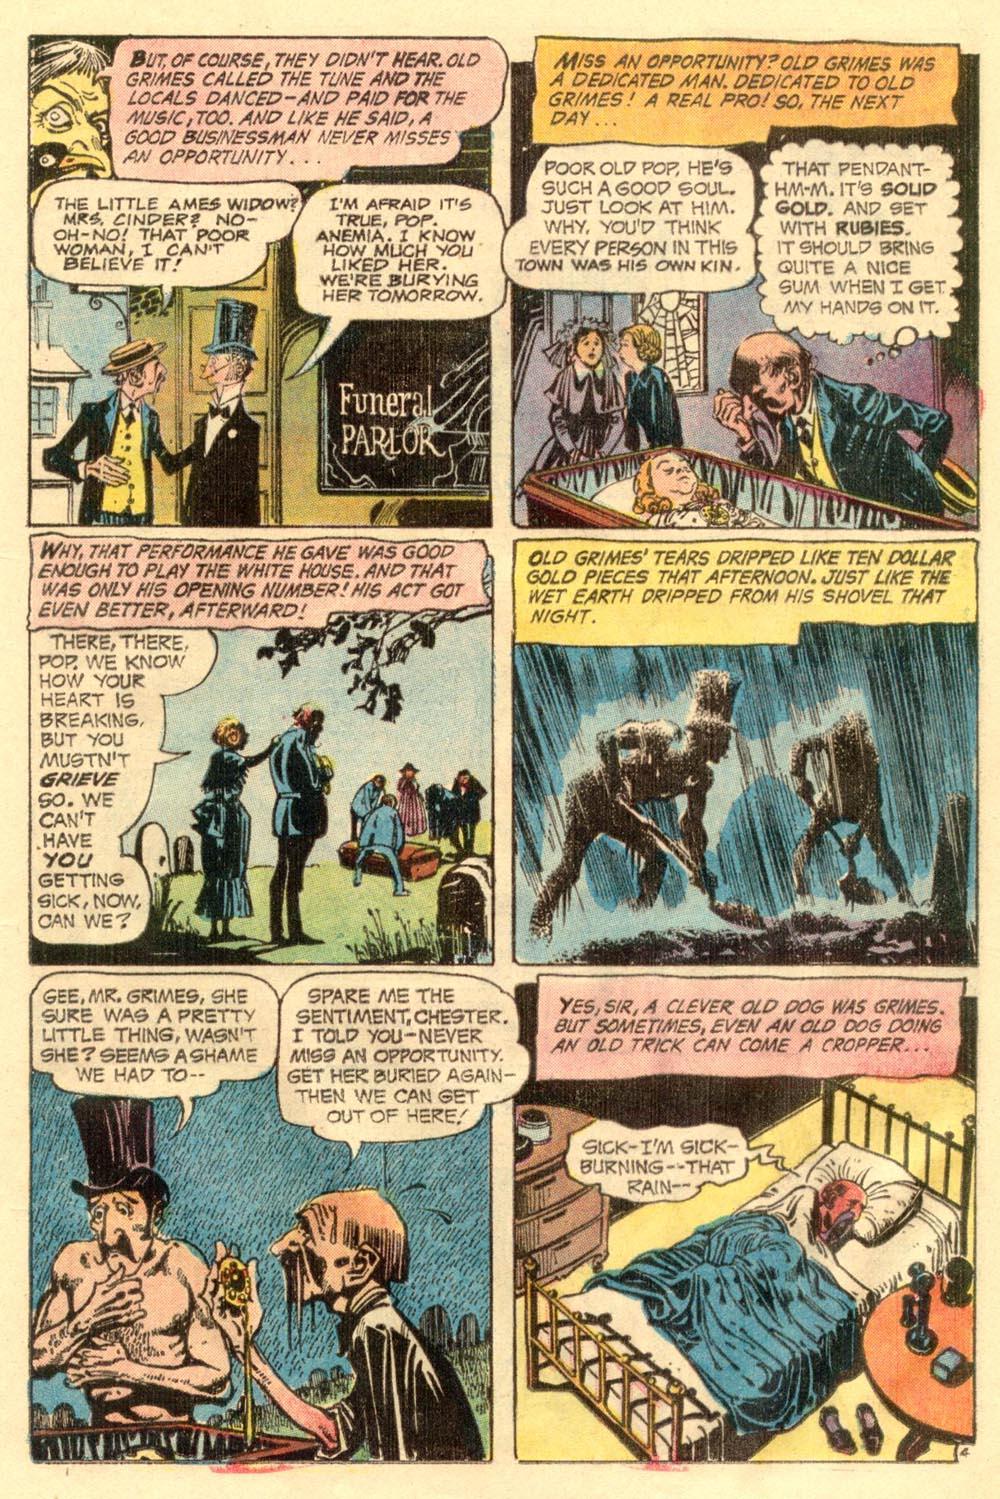 Read online Plop! comic -  Issue #2 - 17